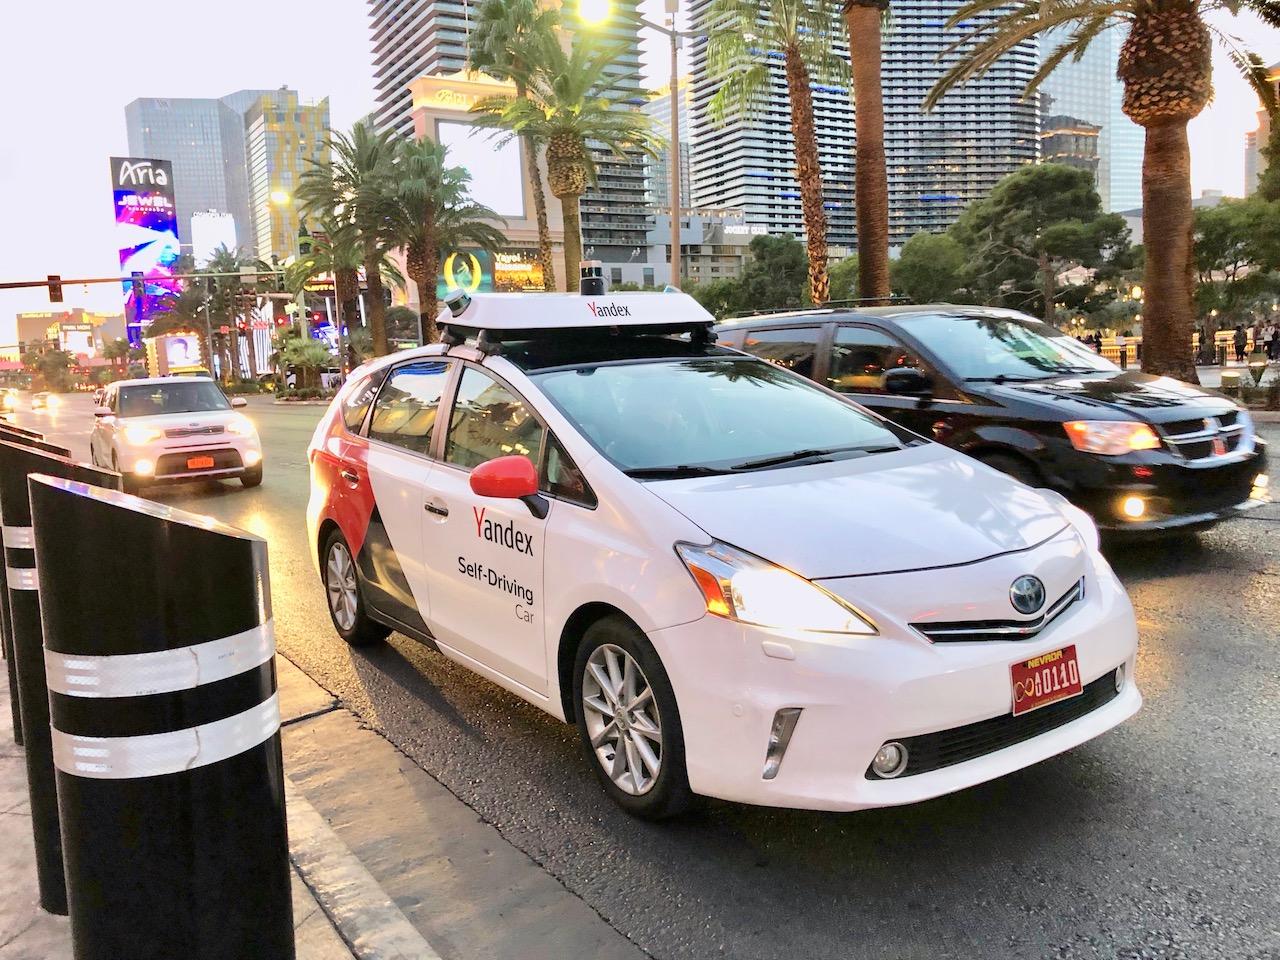 Yandex — Company blog — Yandex to Demo Self-Driving Car at CES 2019